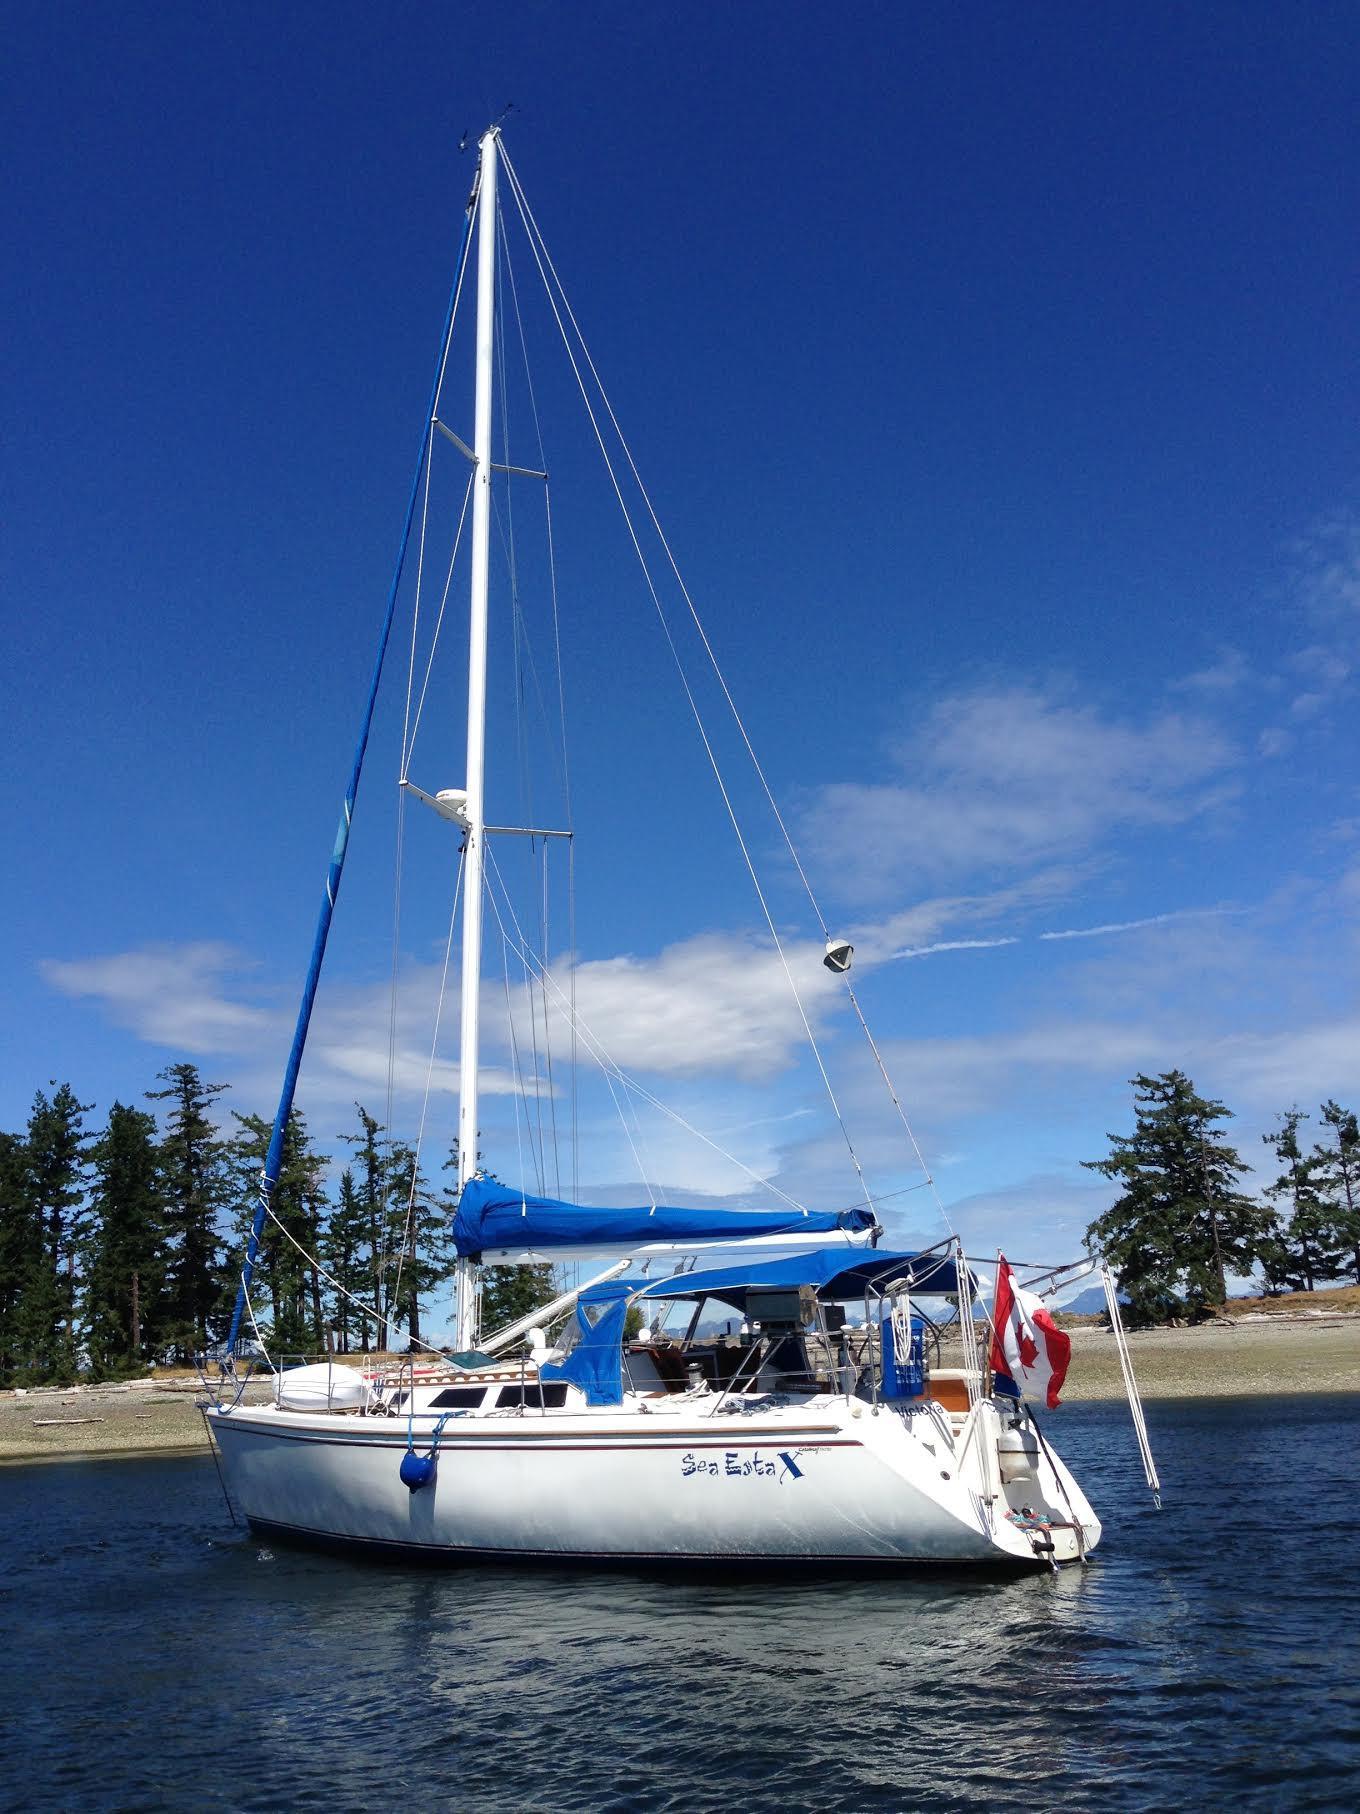 42' Catalina MKI+Boat for sale!